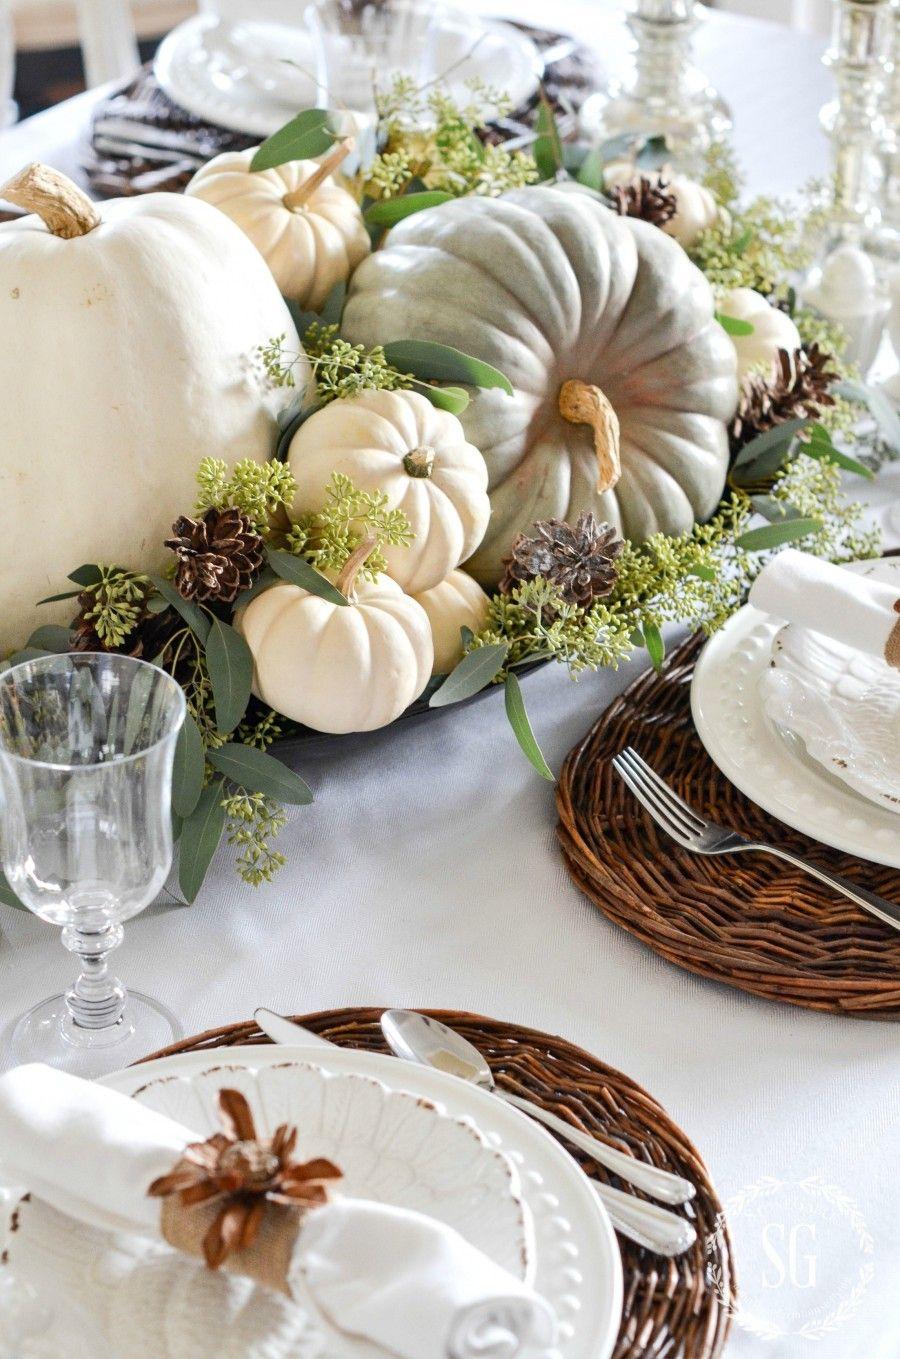 charming pumpkin arrangements that bring the fall into our homes - Charming Pumpkin Arrangements That Bring the Fall Into our Homes